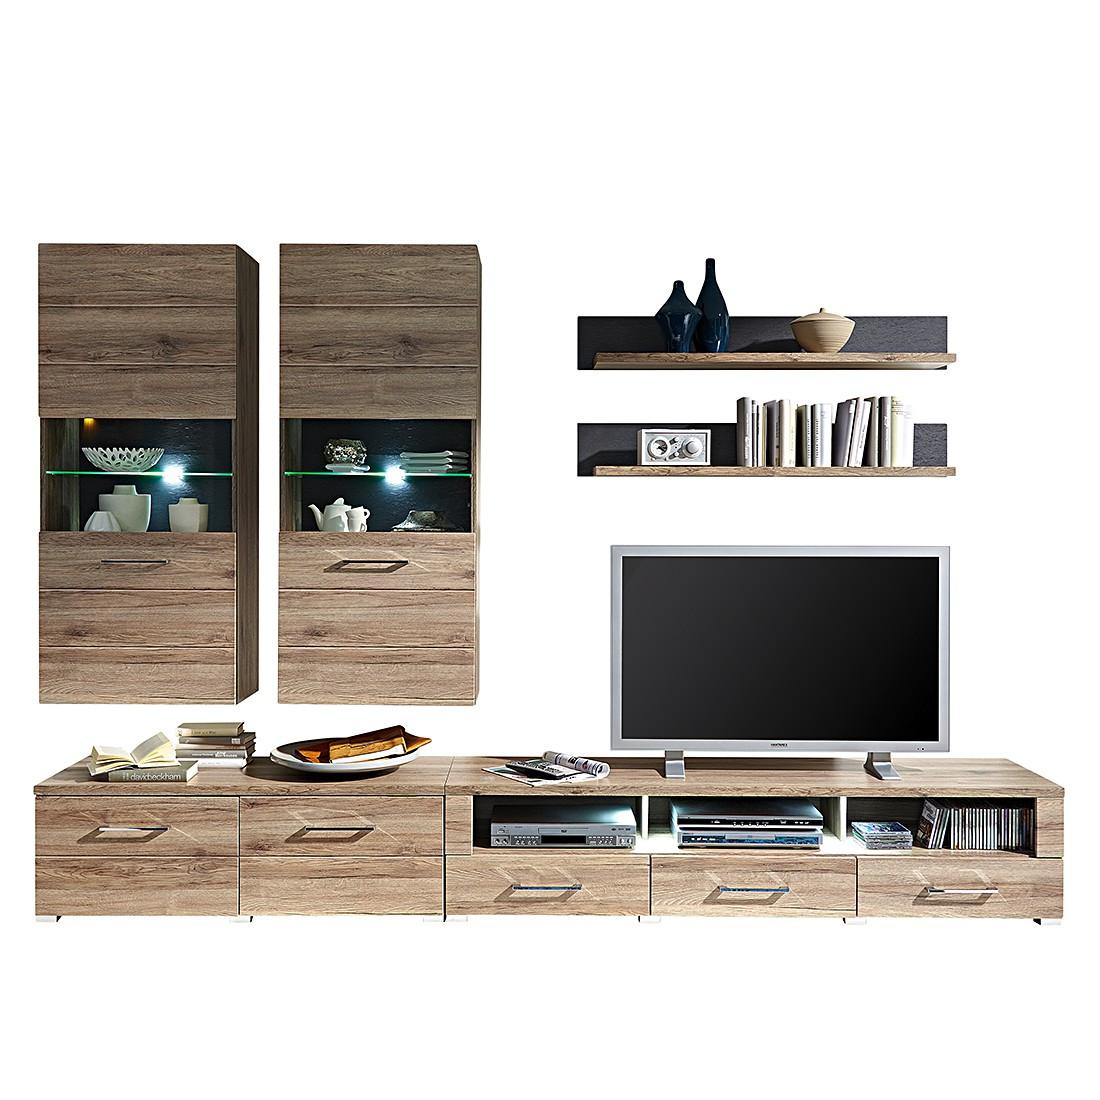 wohnwand adorno ii 6 teilig inkl beleuchtung san. Black Bedroom Furniture Sets. Home Design Ideas